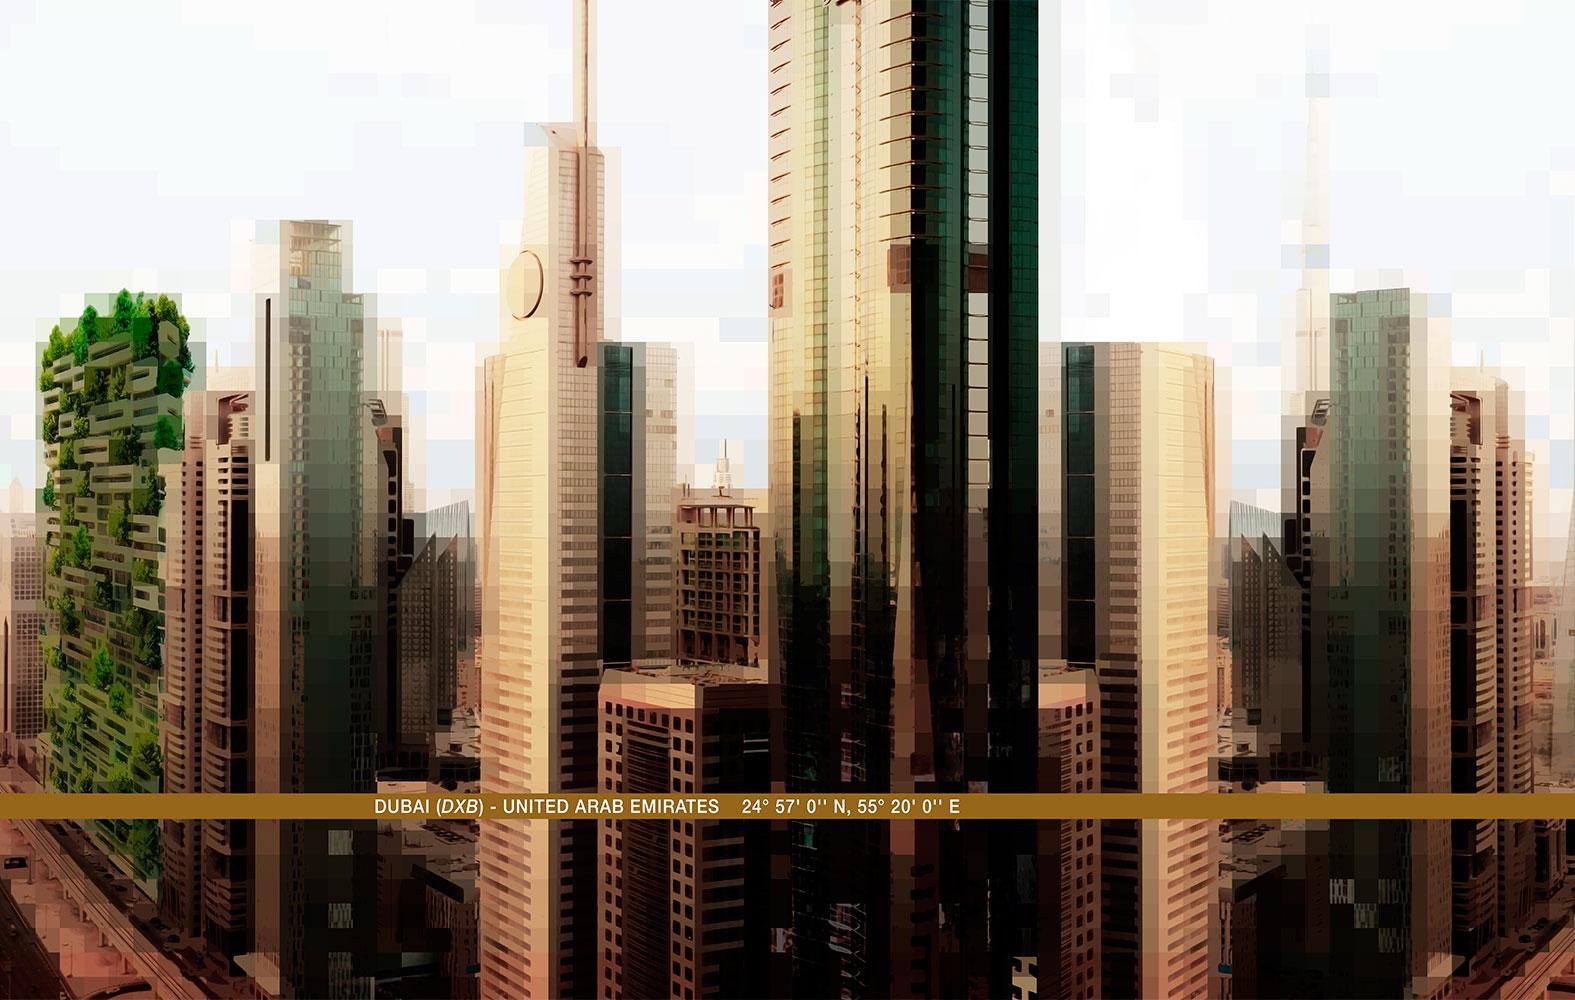 StudioErnst-HMShost-cityscapes-dubai